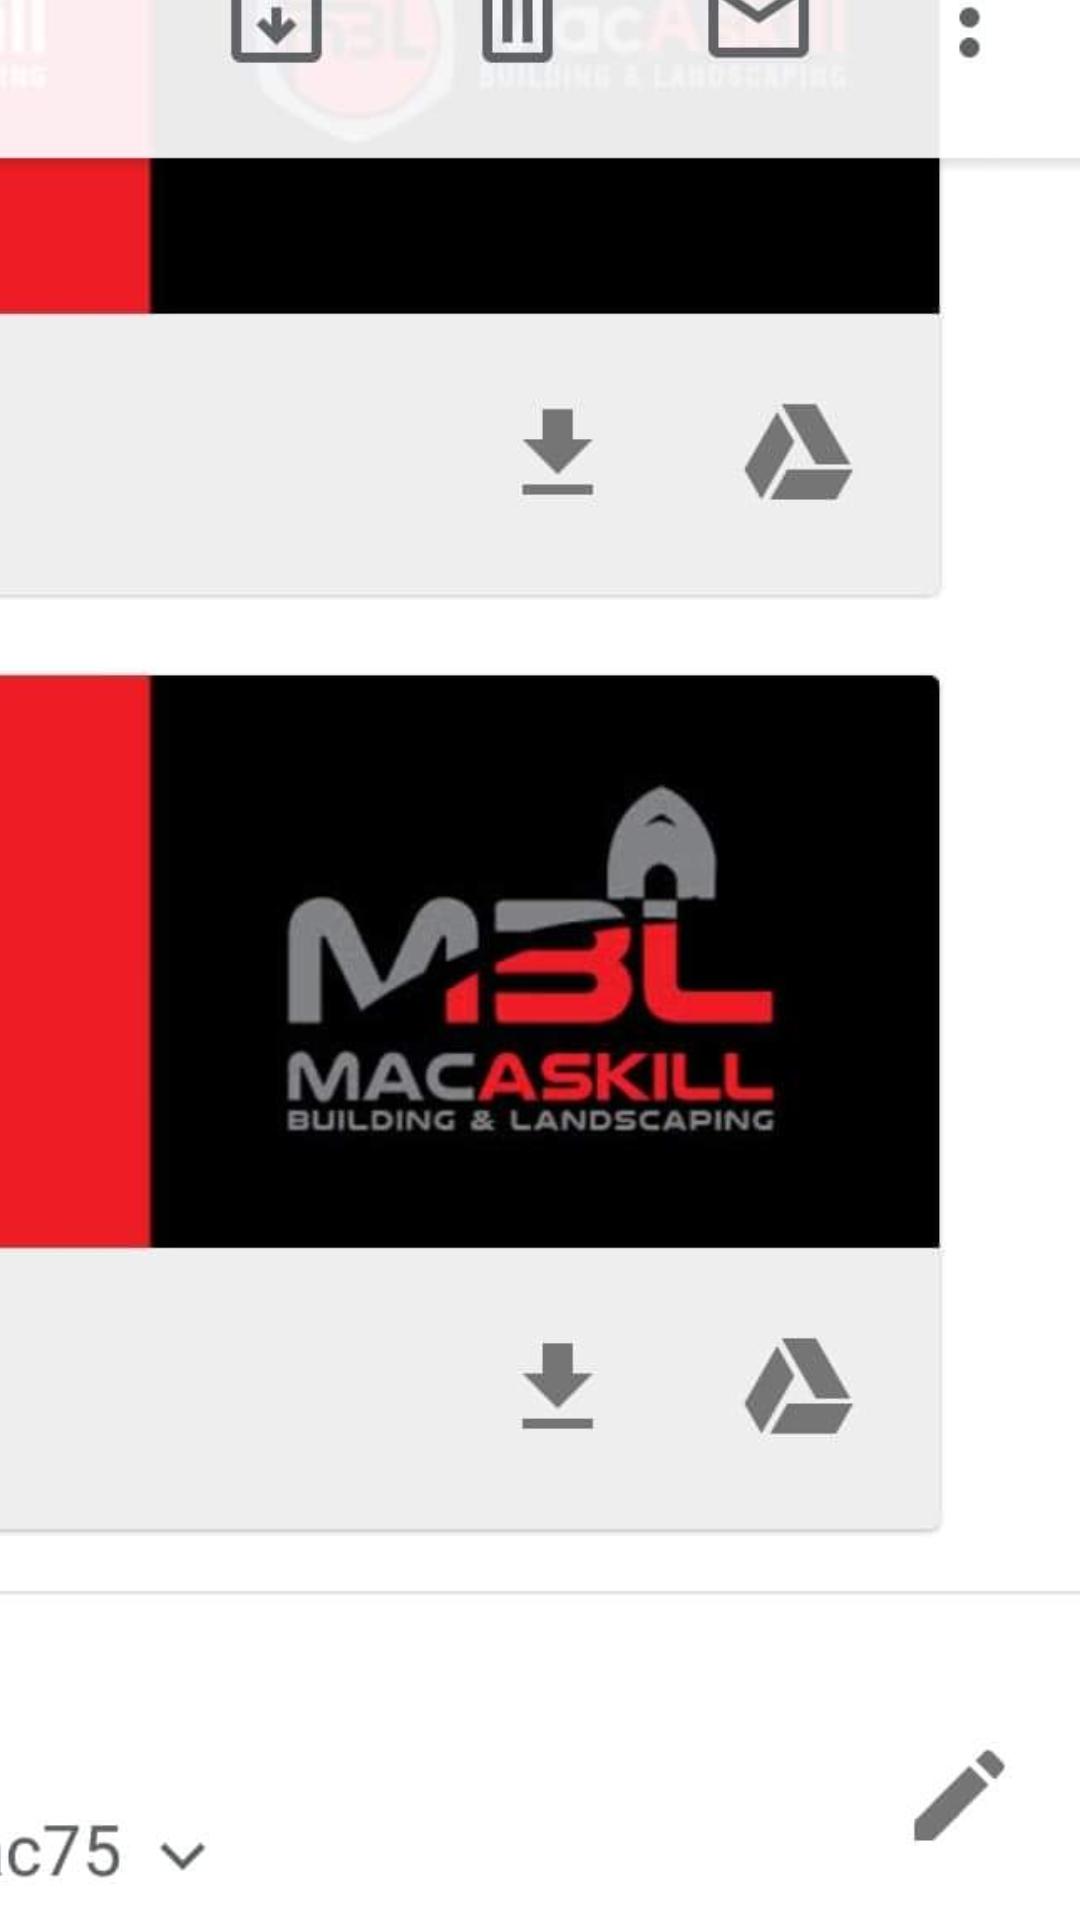 MacAskill Building & Landscaping Verified Logo